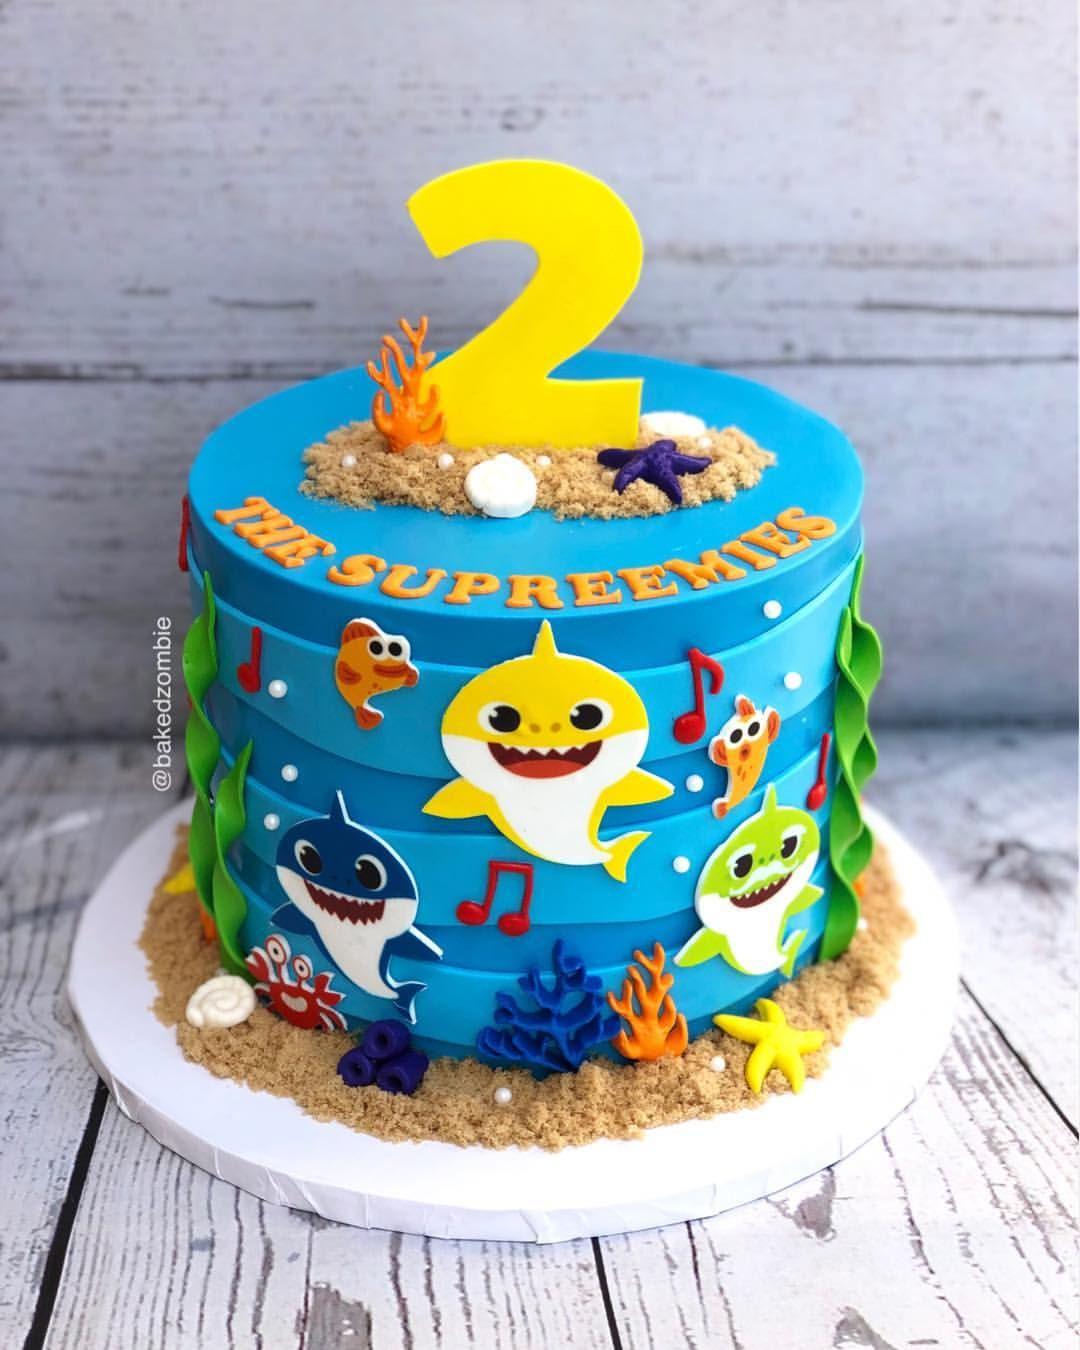 Baby Shark 🎶🎶 Baby shark, Shark birthday party, Boy